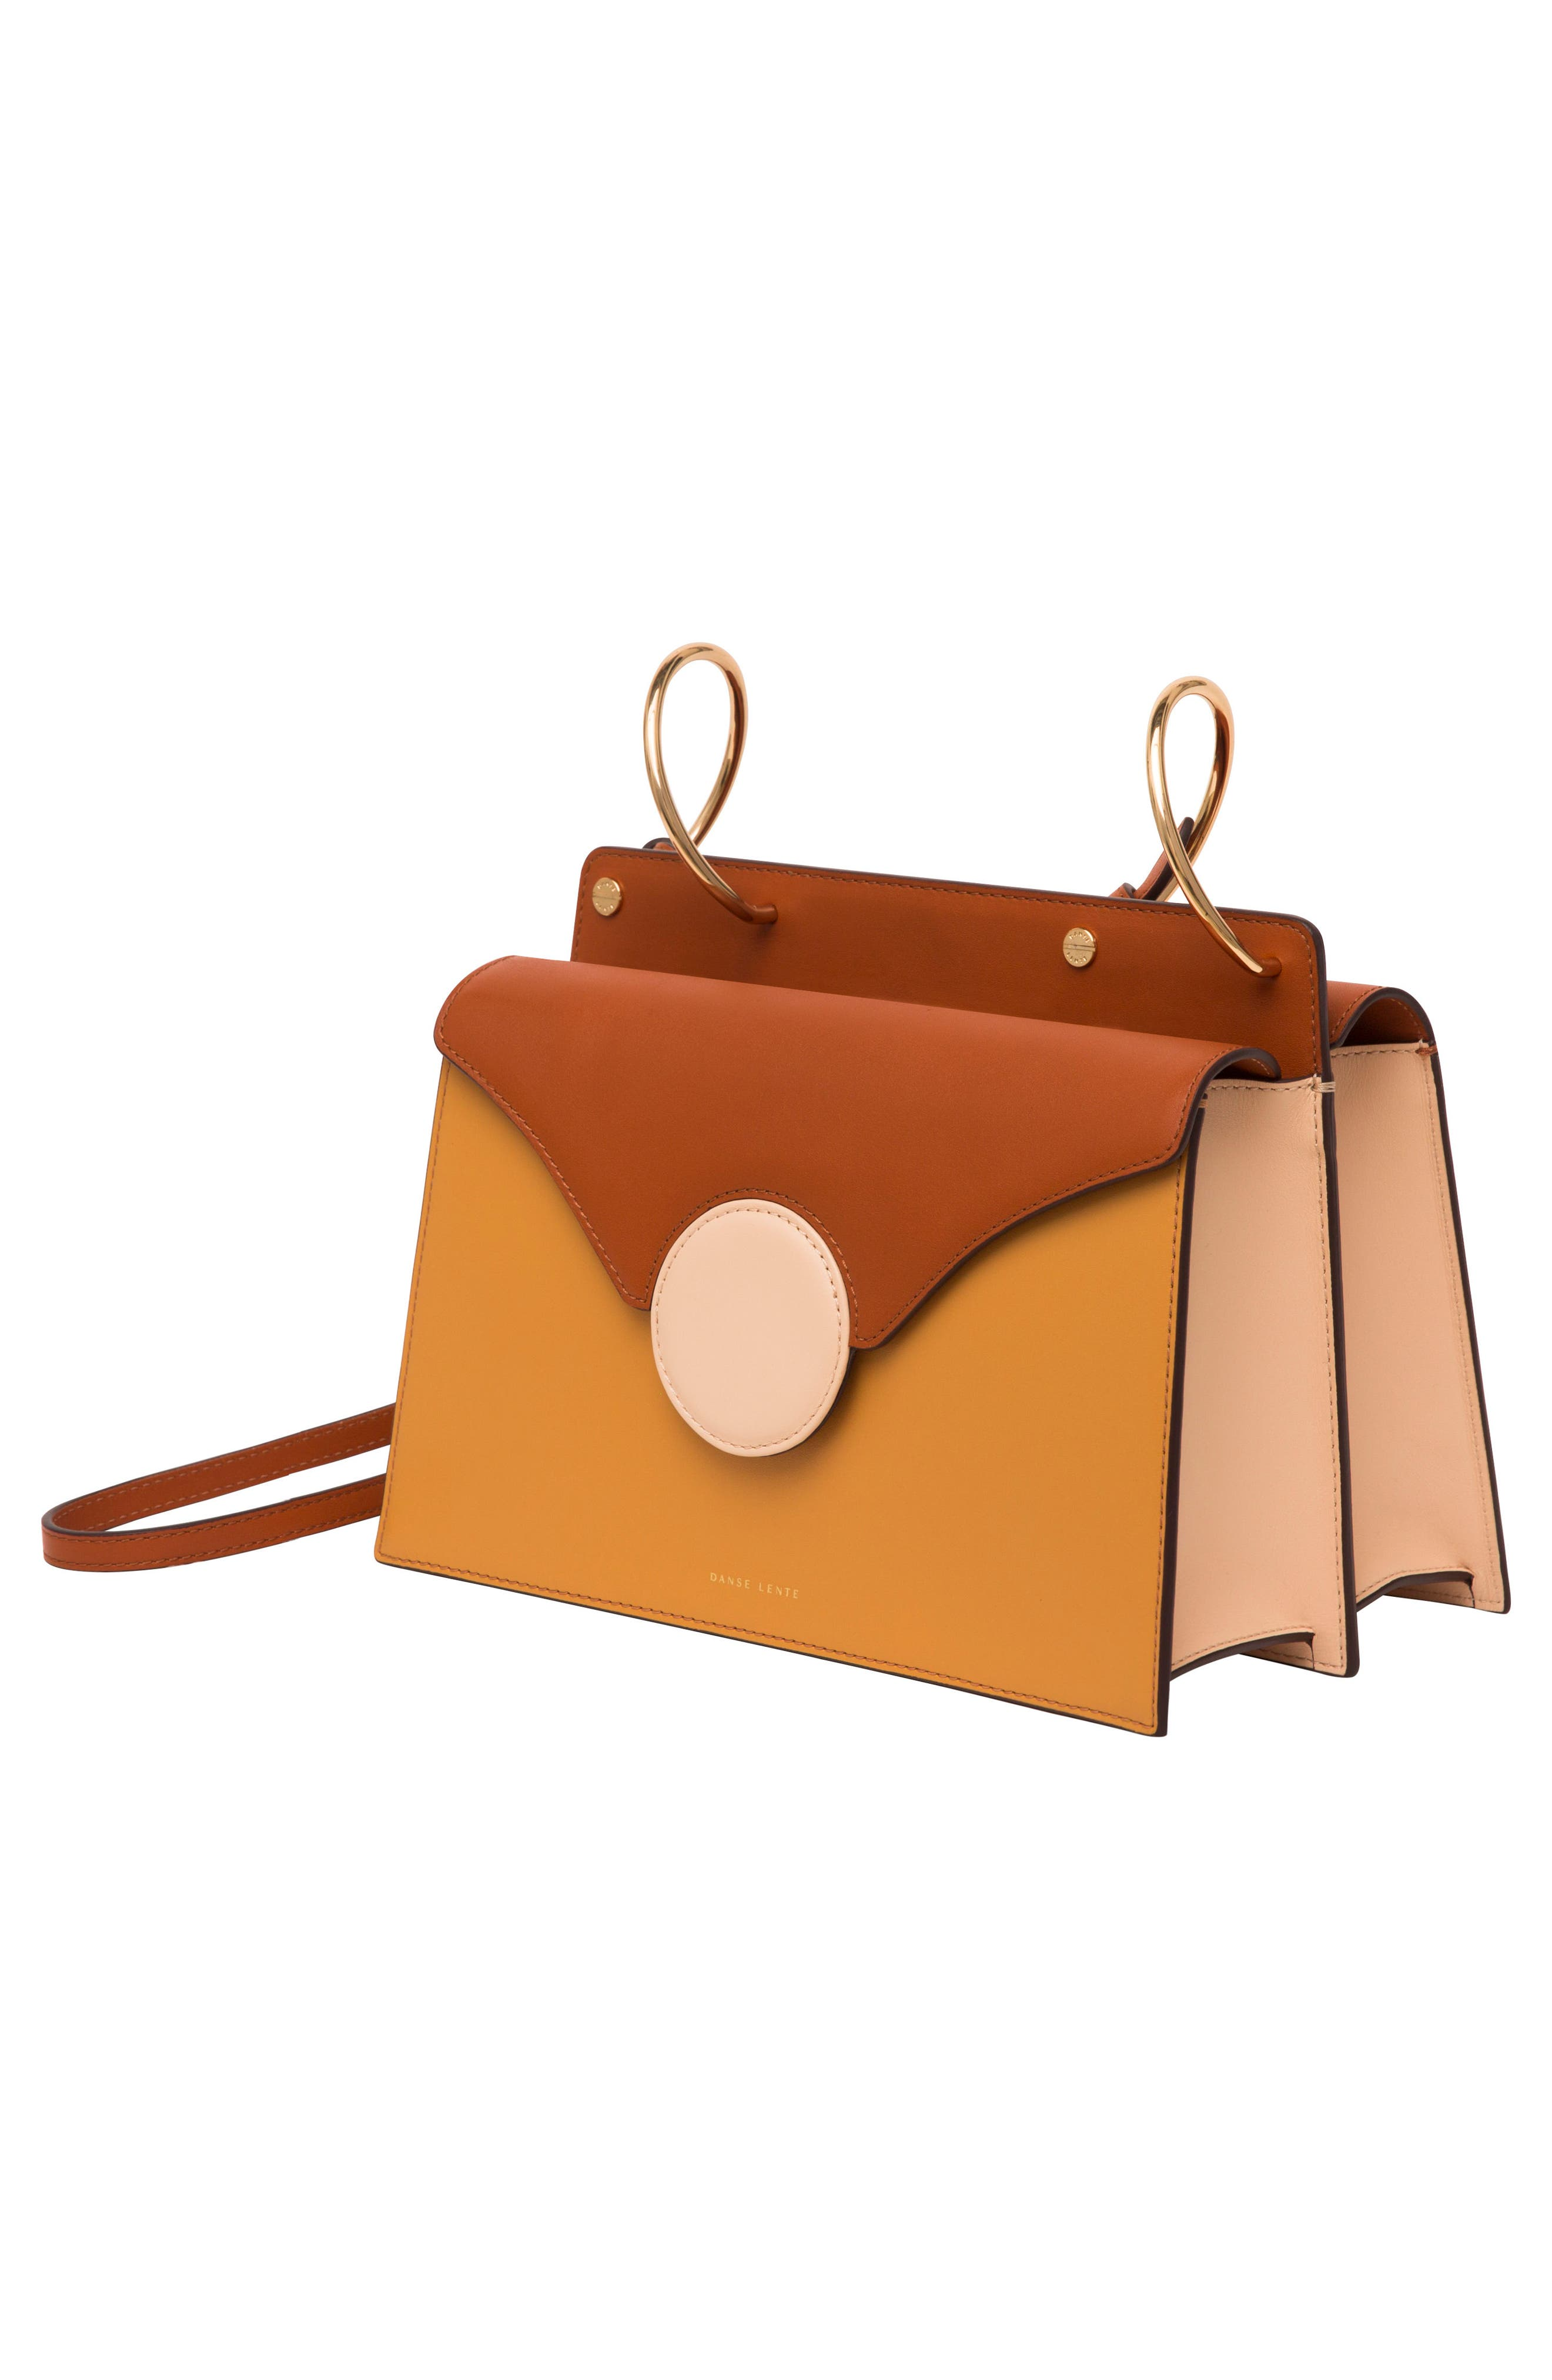 Phoebe Leather Crossbody Bag,                             Alternate thumbnail 6, color,                             SAND/ AMBER